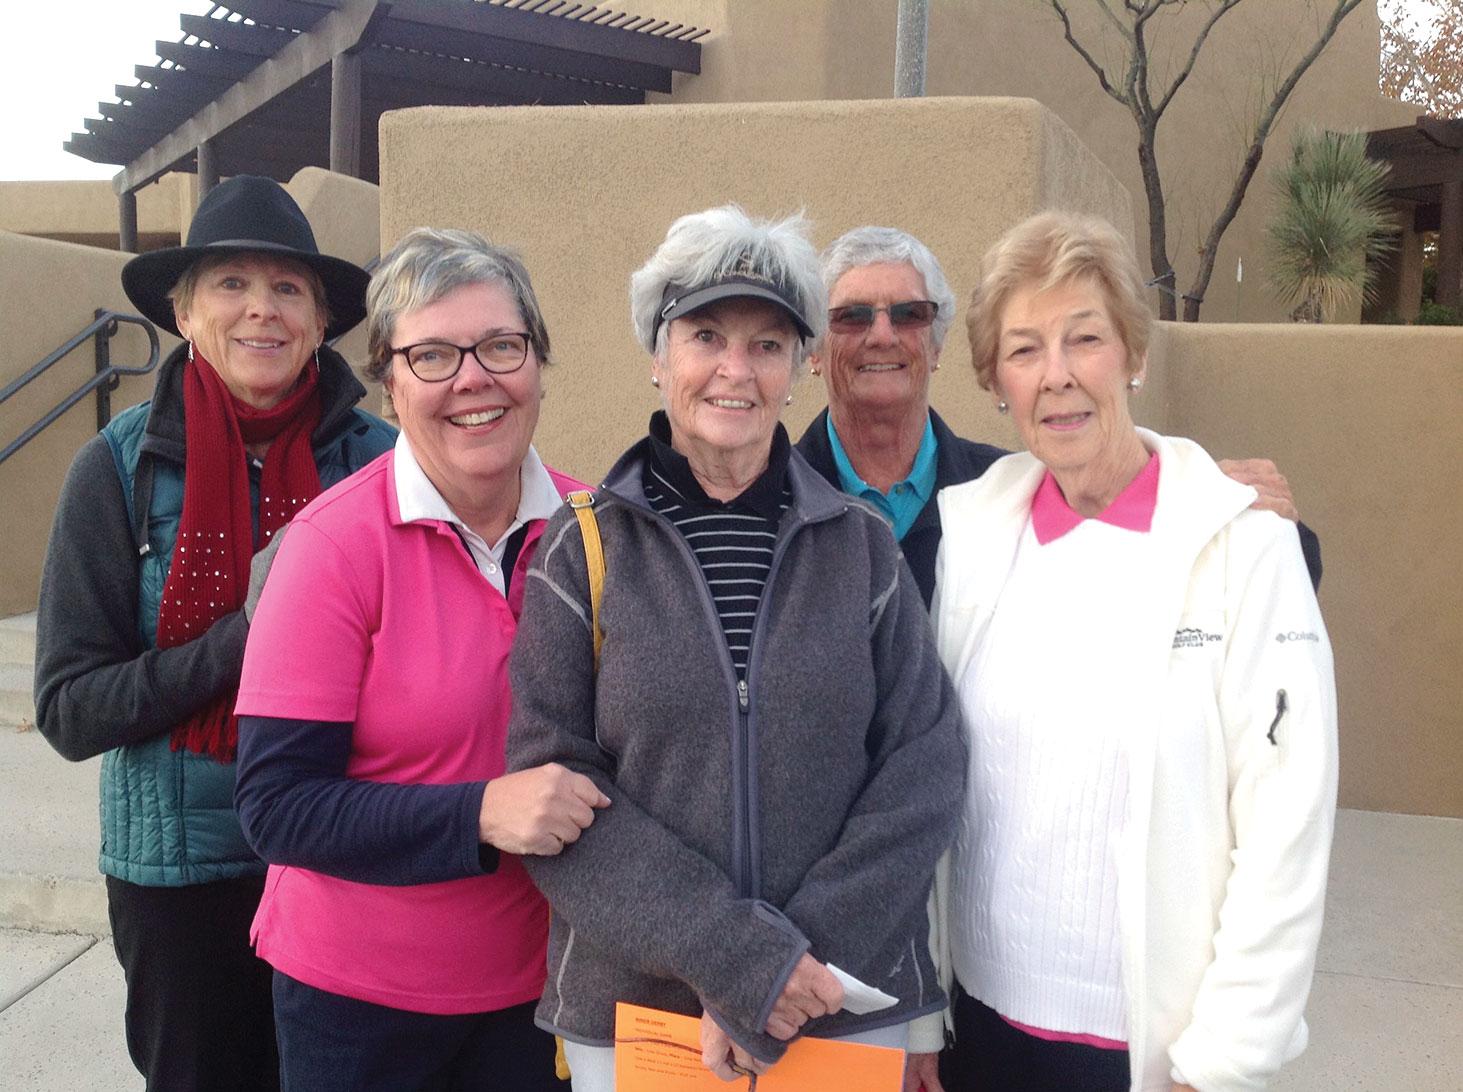 Left to right: Joyce Sutay, Carol Thompson, Susan Elliott, Becky Fisher, Carol Larson